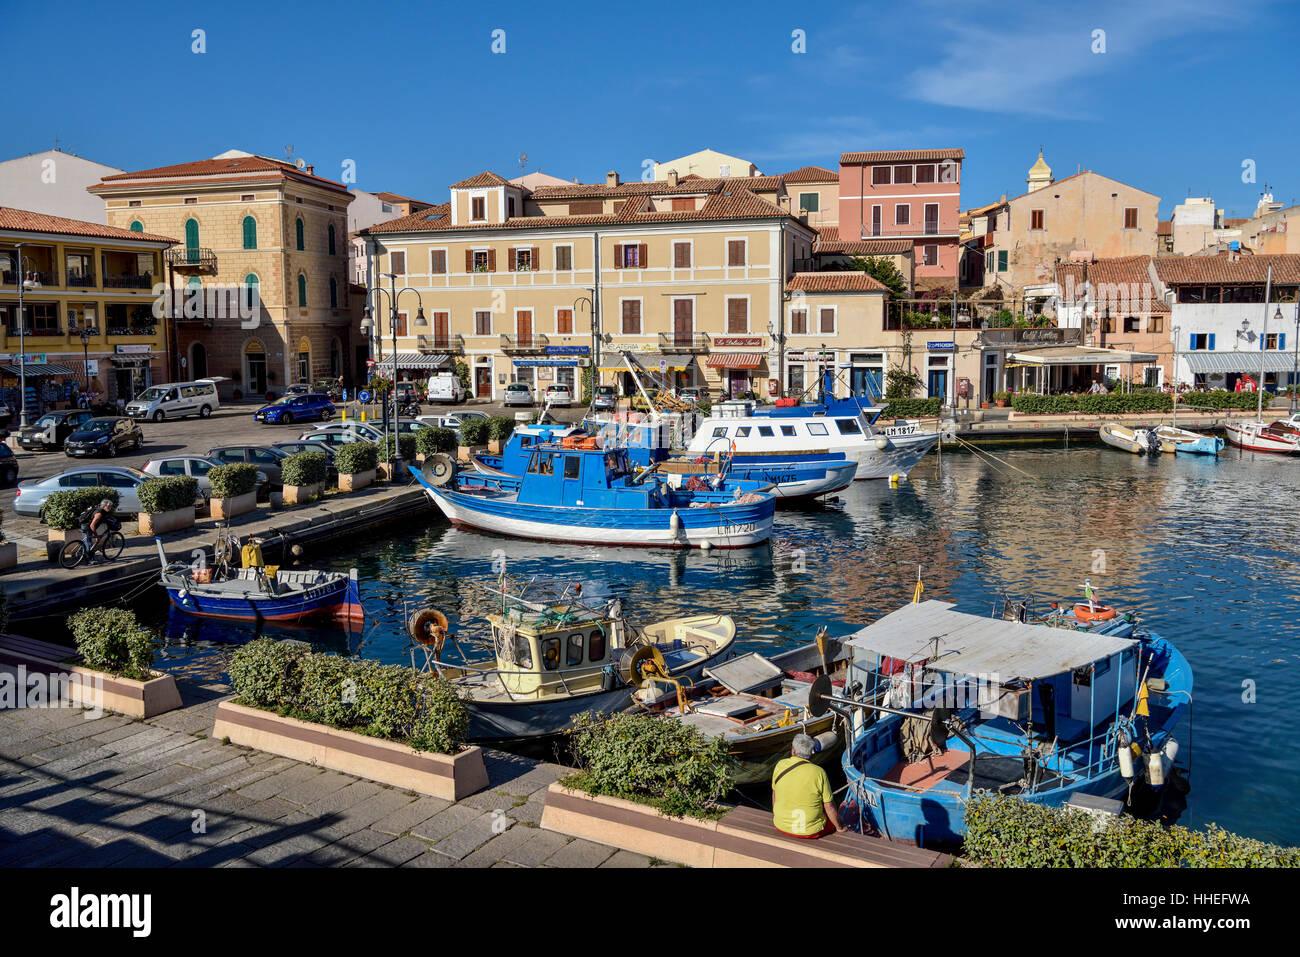 Port, La Maddalena, Gallura, Olbia-Tempio Province, Sardinia, Italy - Stock Image